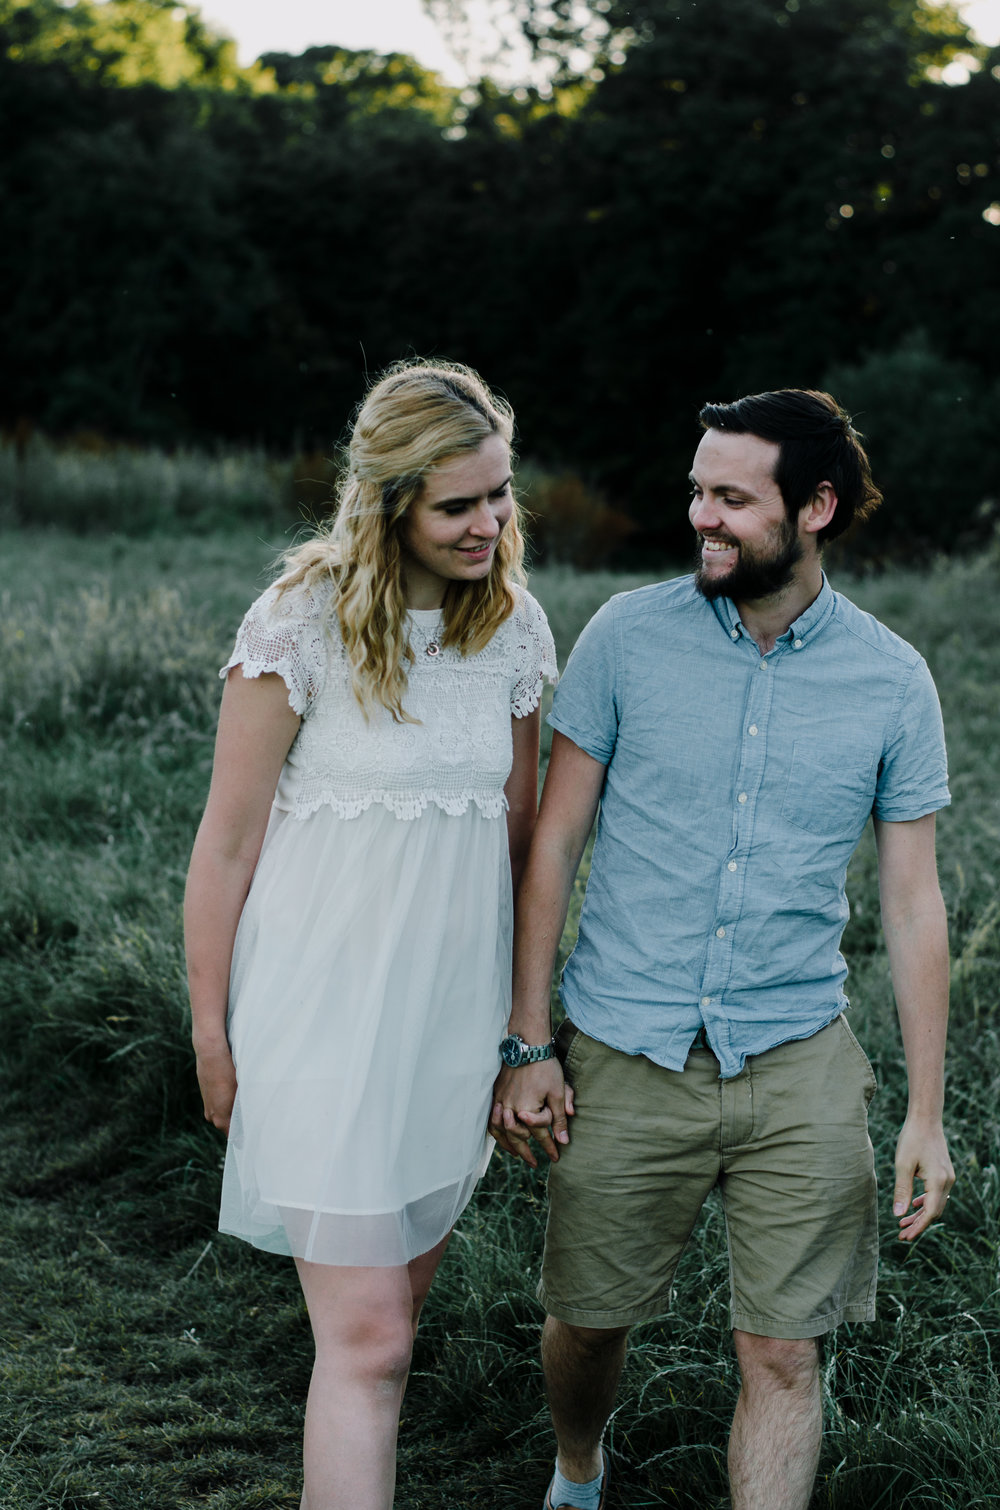 Gina & Chris - Barcombe Mills - Couple Session - Aiste Saulyte Photography-44.jpg